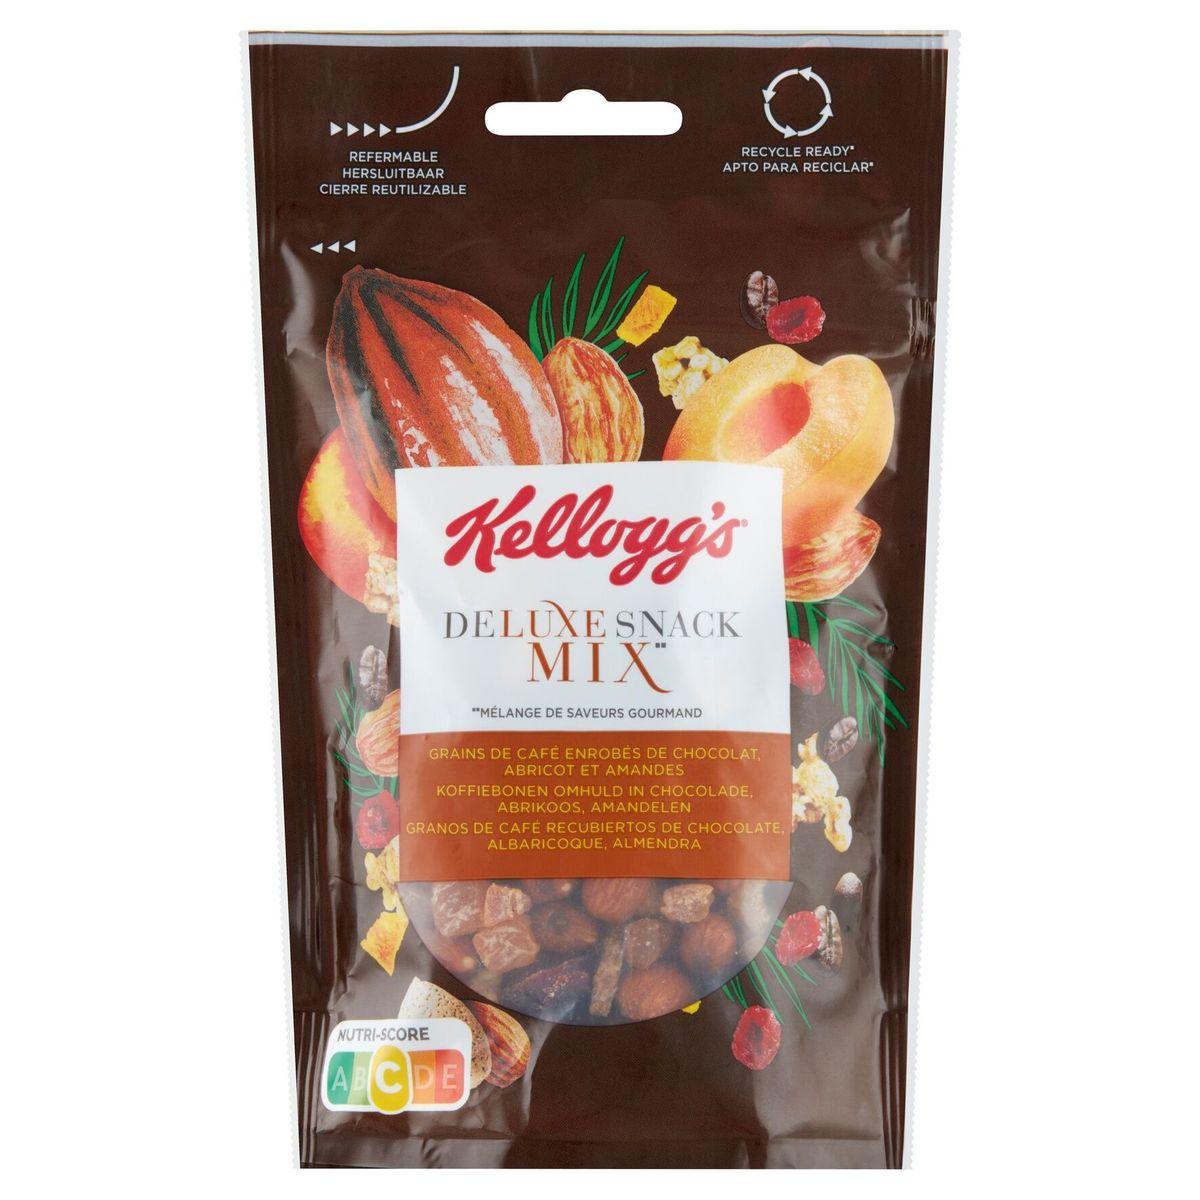 Kellogg's Deluxe Snack Mix Choco Coffee 100 g